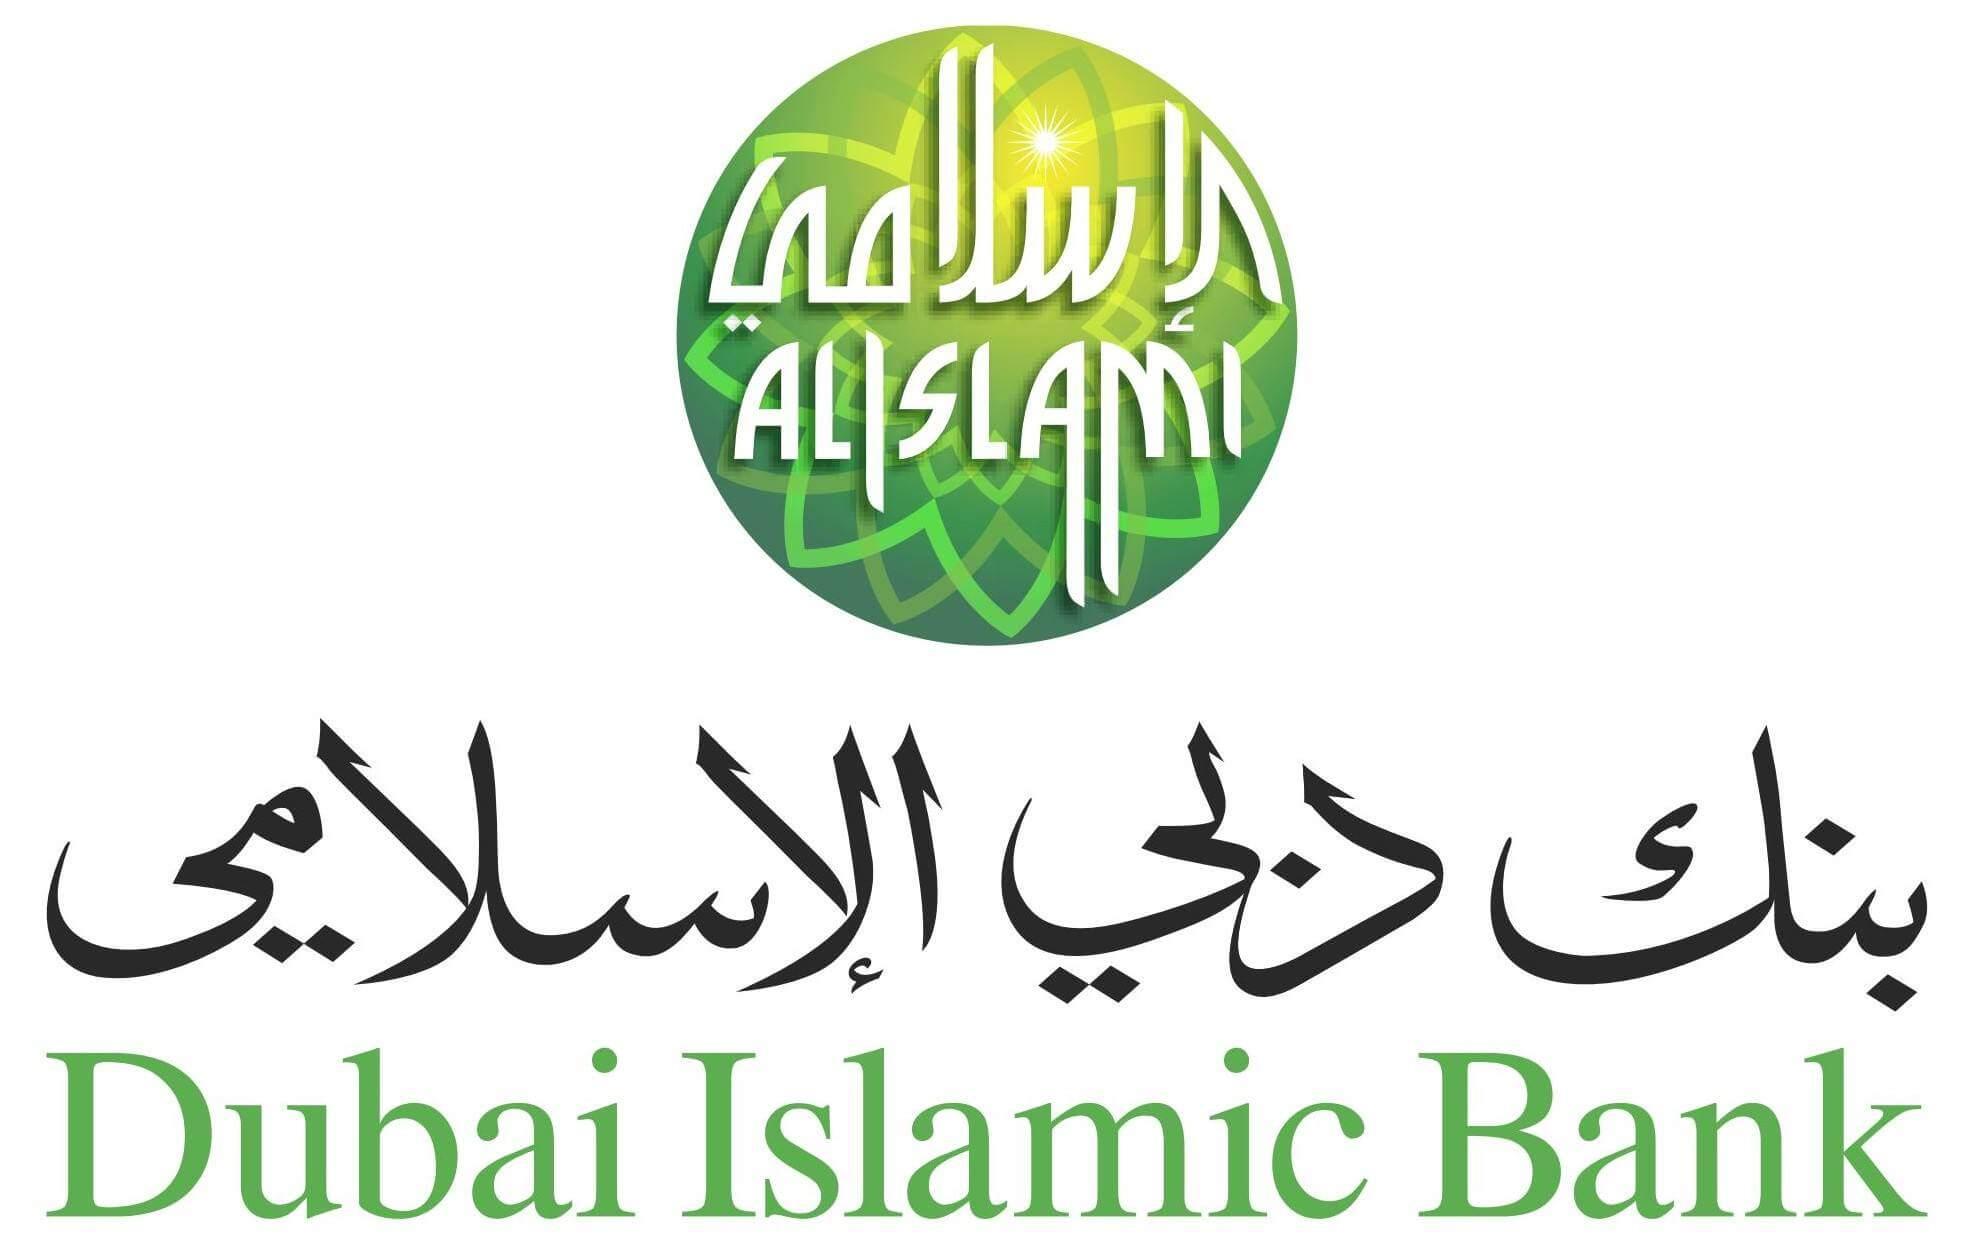 Dubai Islamic Bank Logo [EPS File] png